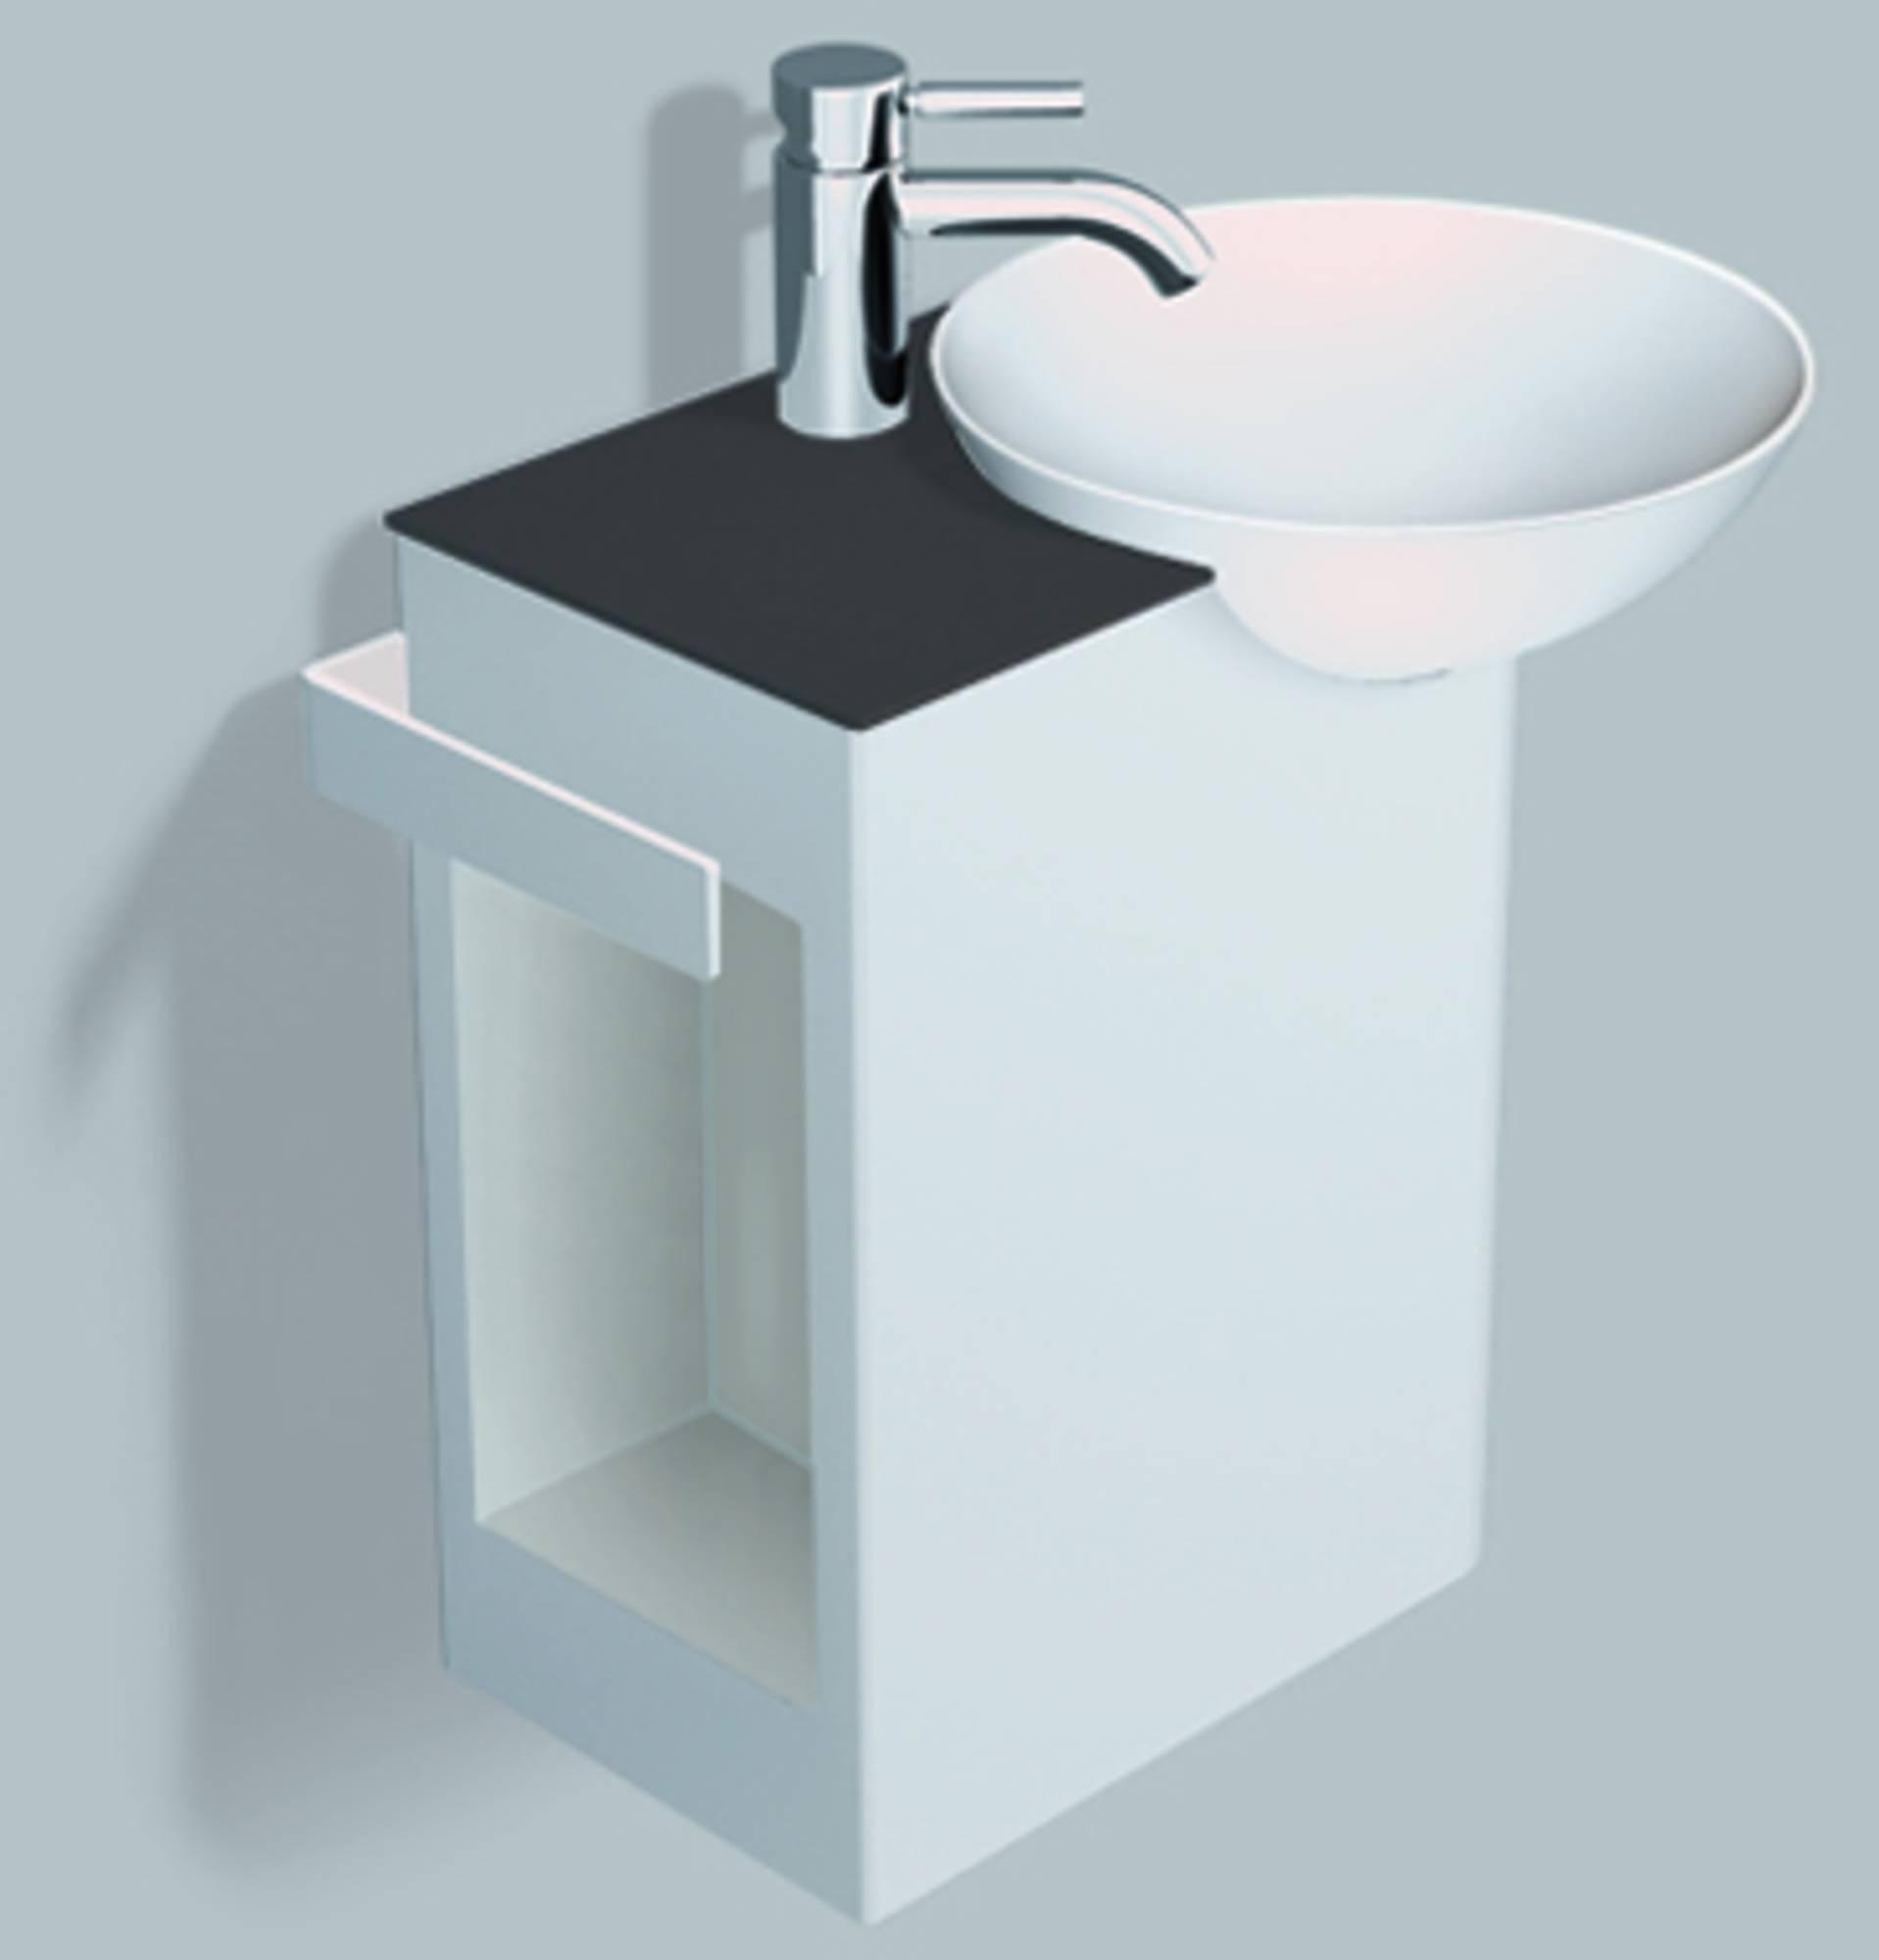 Alape Wp.insert 2 meubelset 48,5cm,wastafel rechts aflegvlak links, wit-antracietbruin